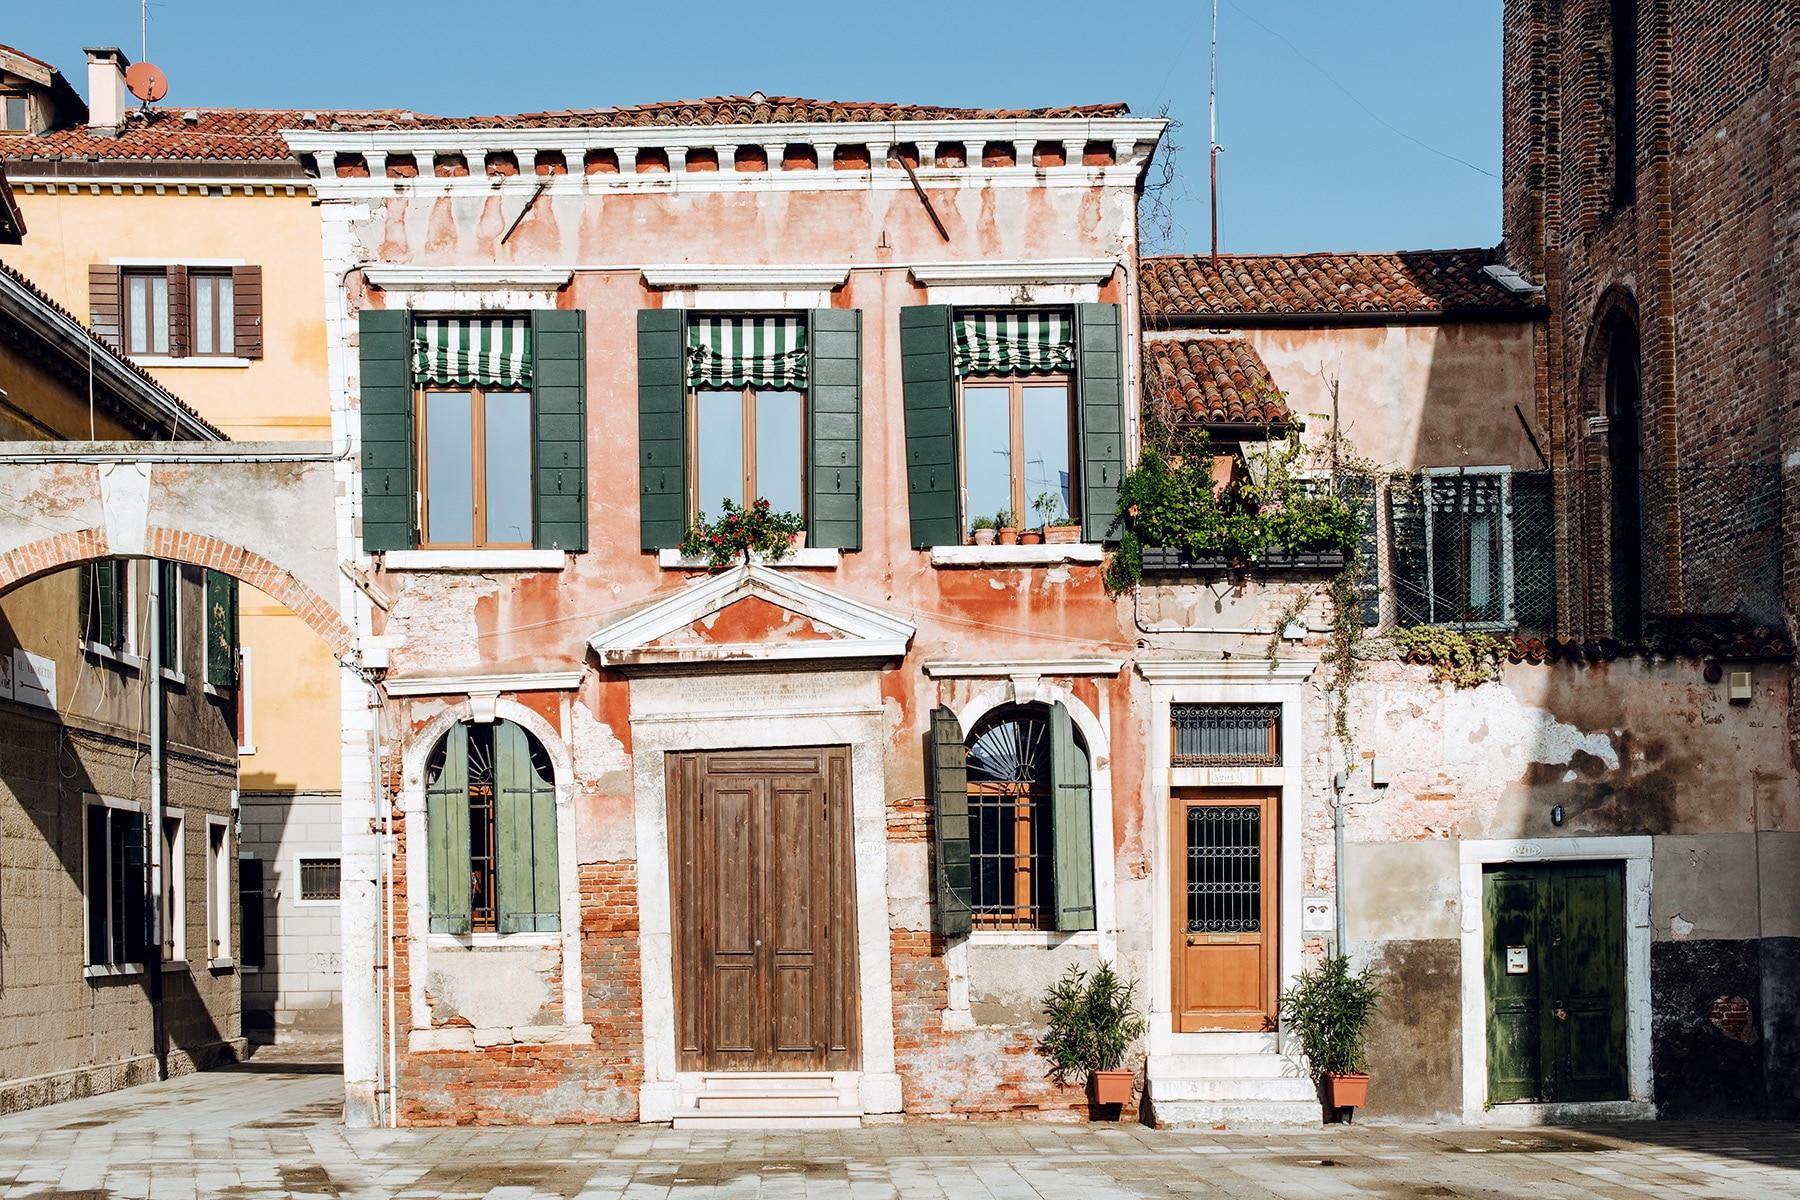 Balade dans le quartier de Cannaregio à Venise